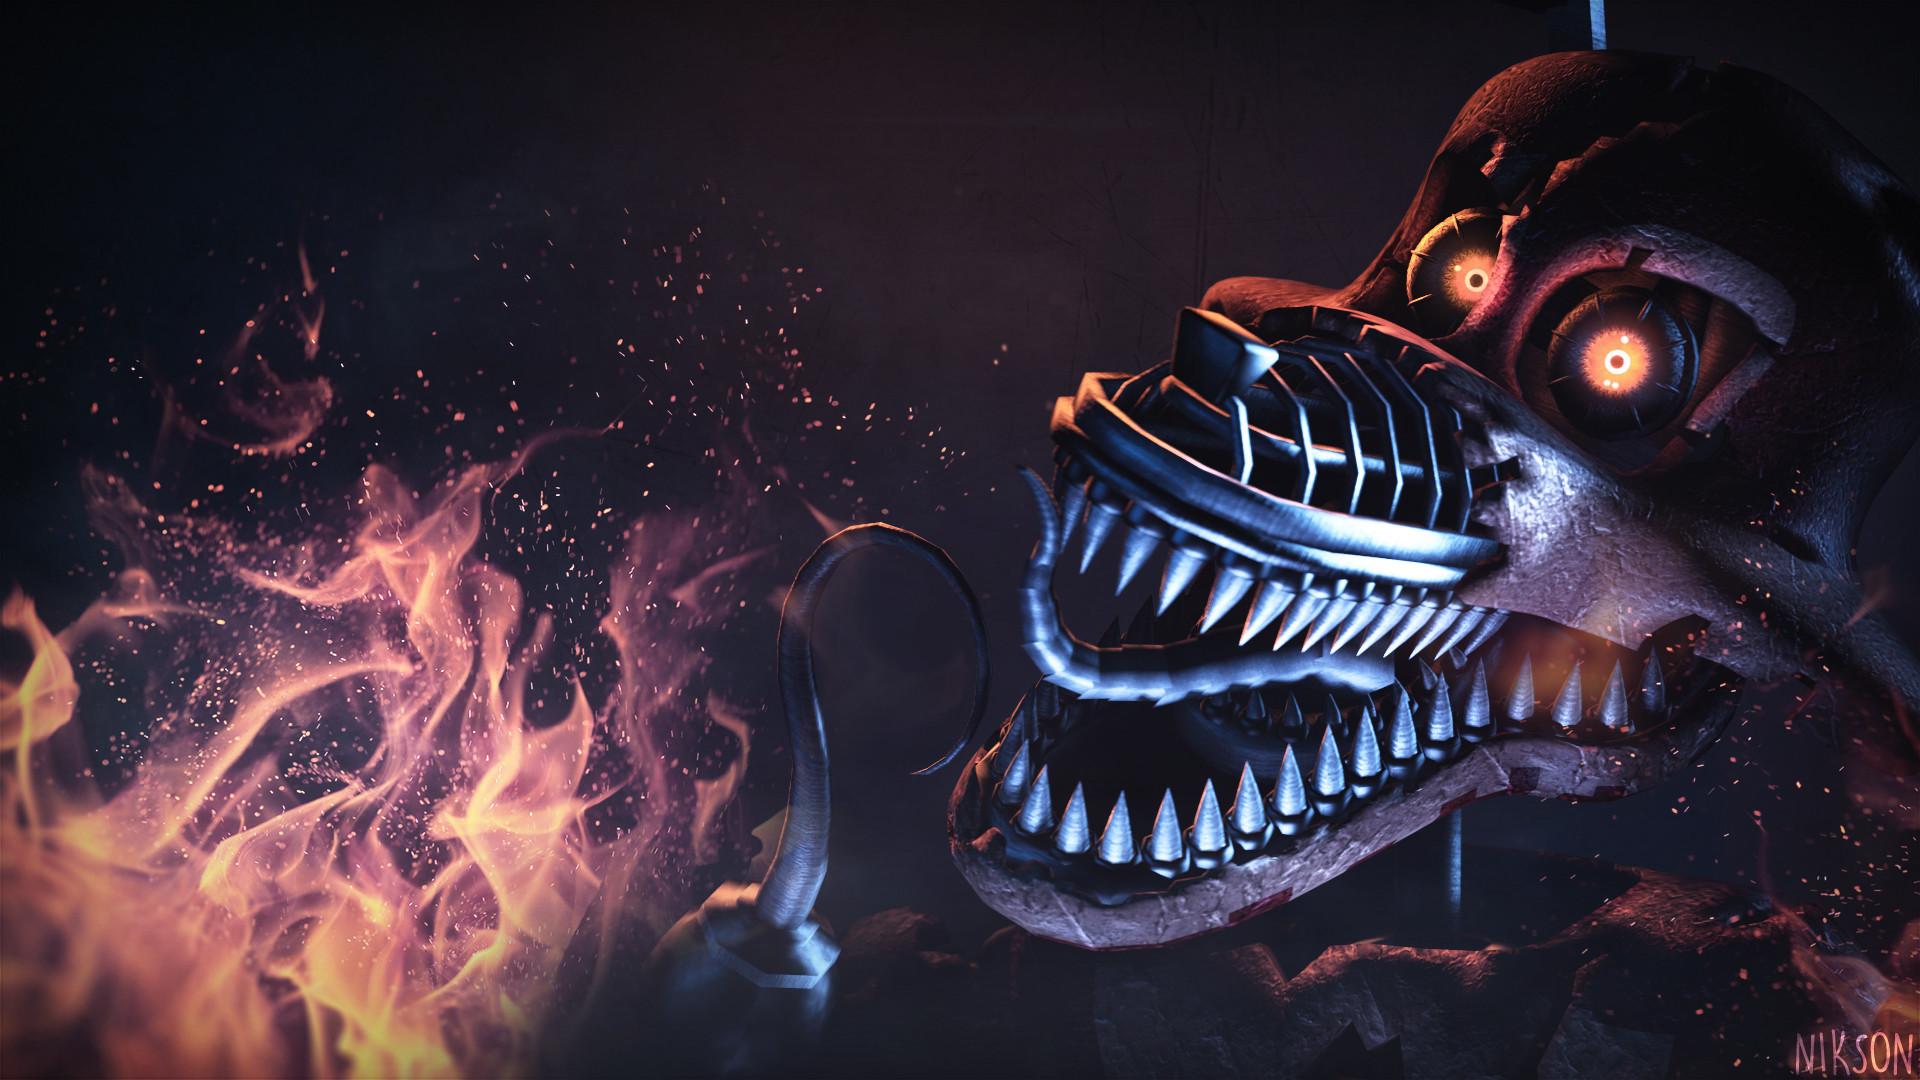 Nightmare Foxy | Wallpaper 1080p …